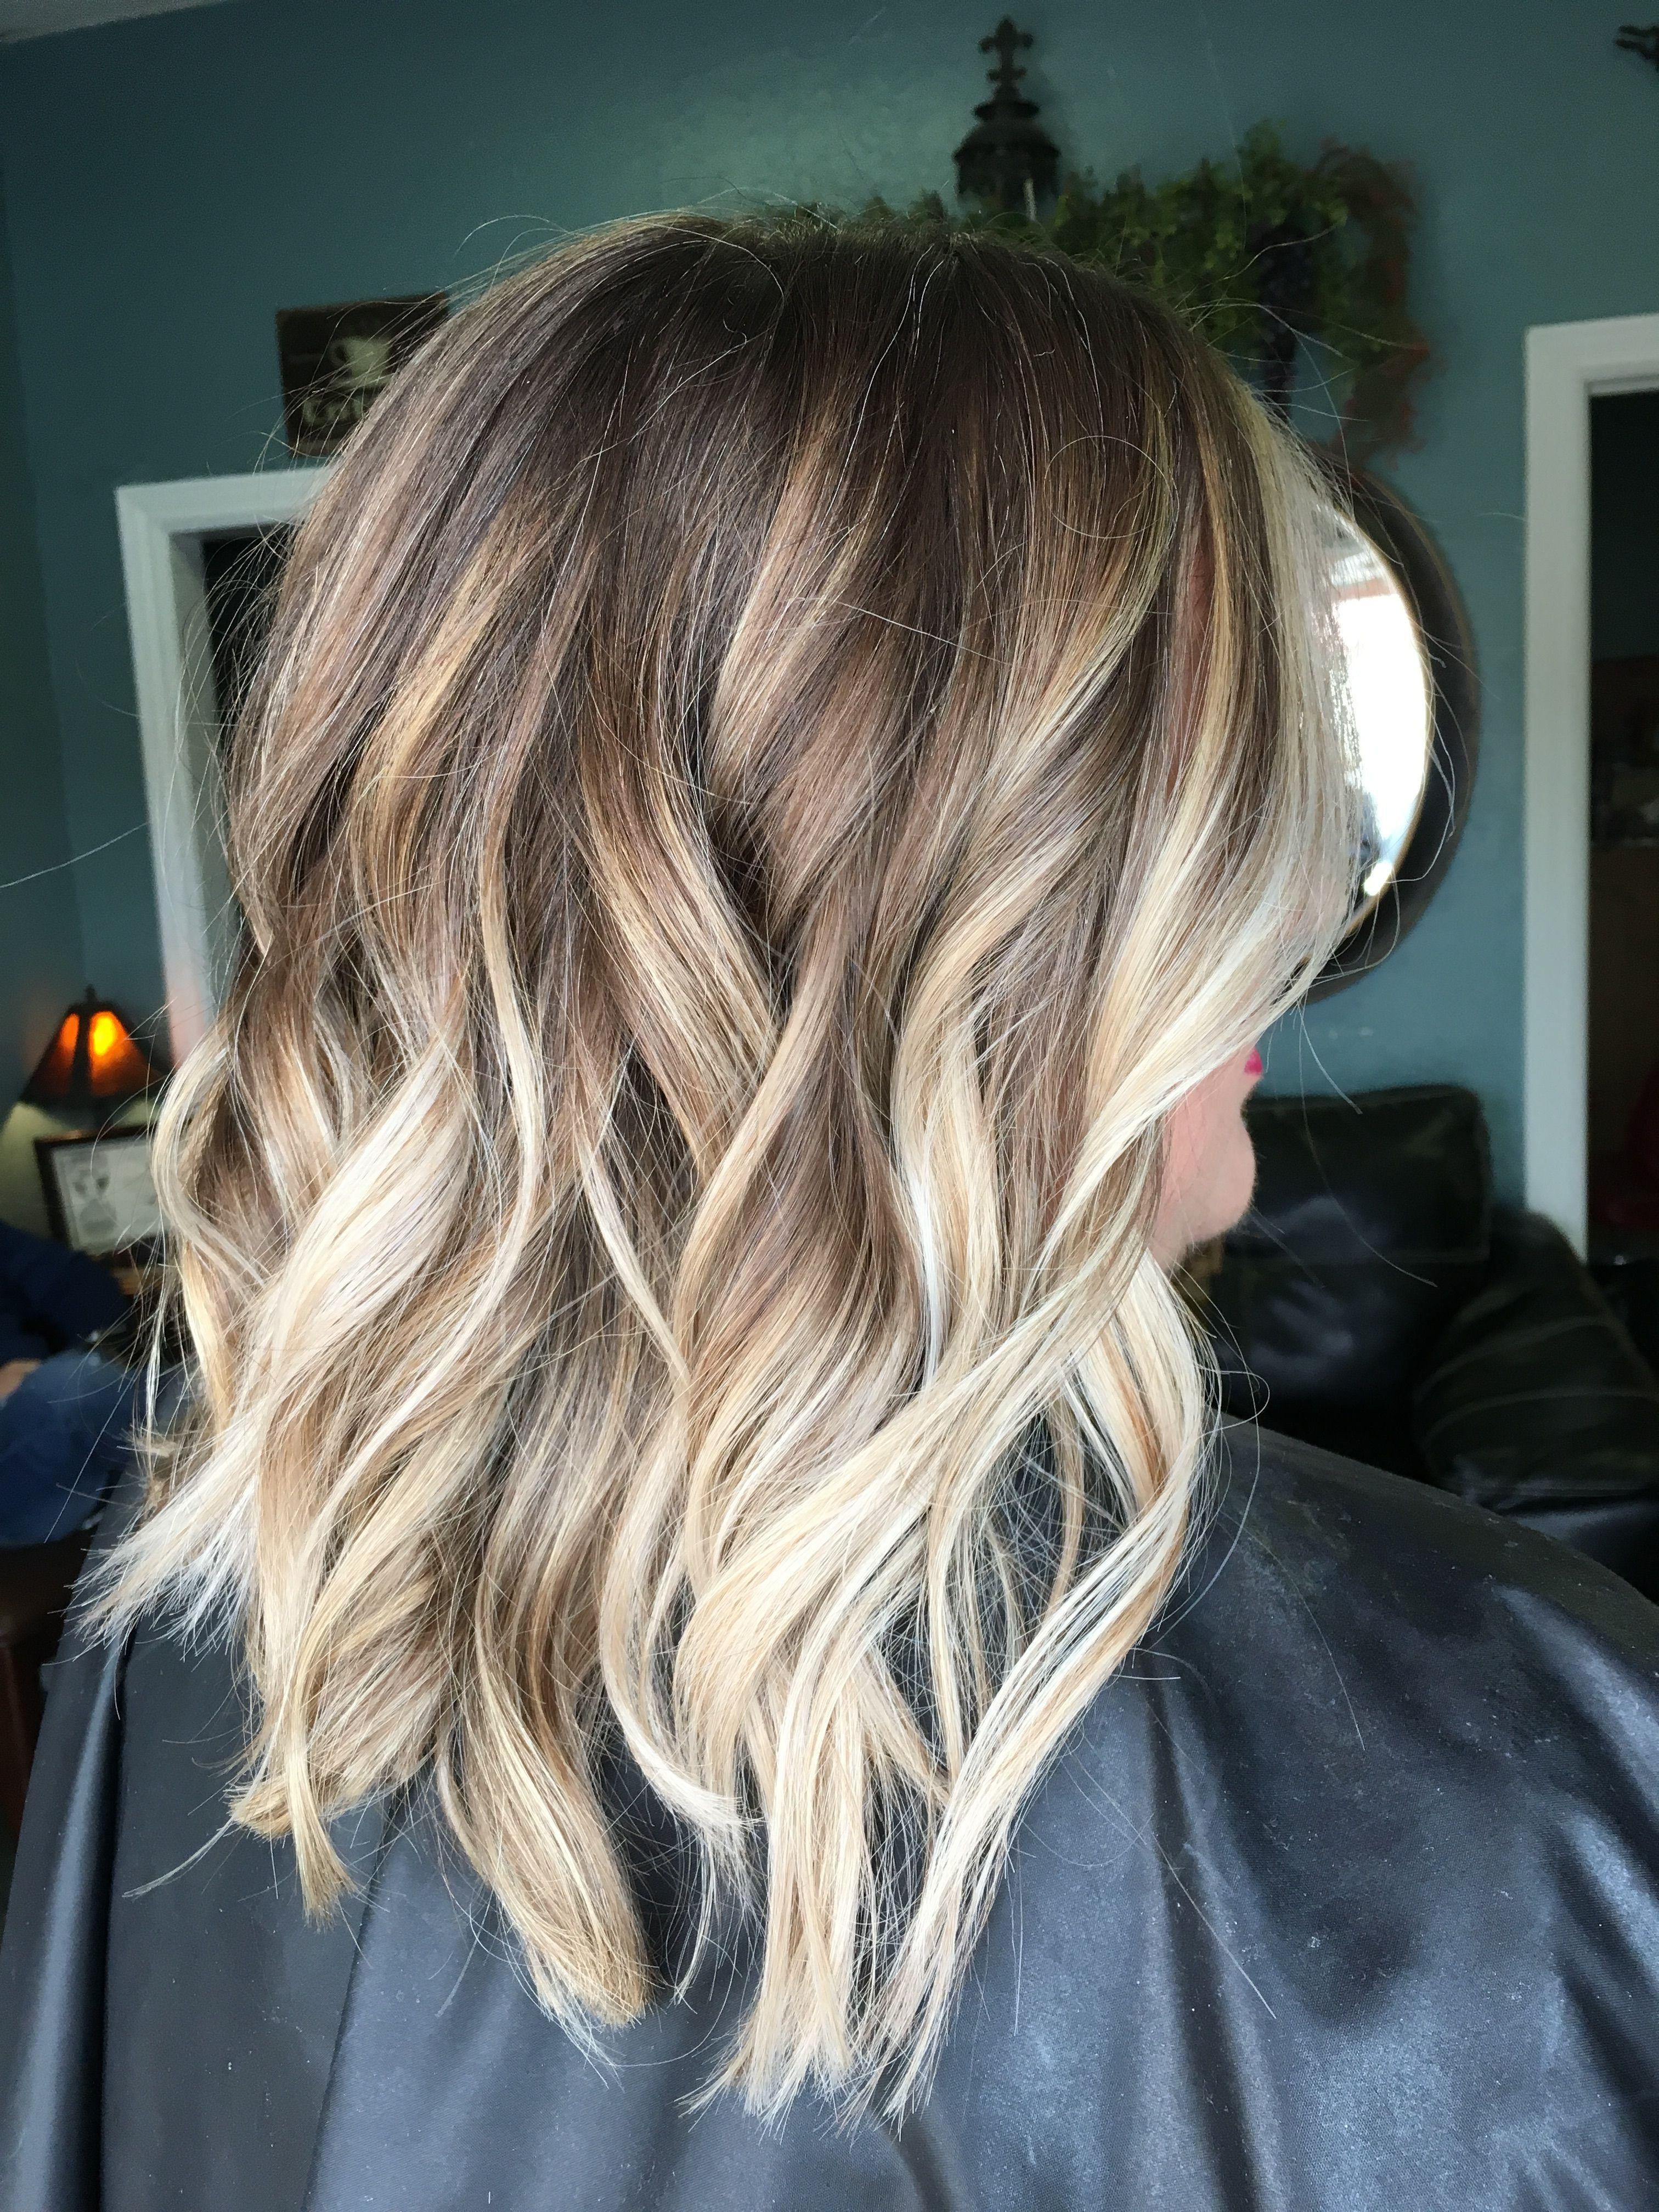 Balayage blonde hair brown hair blonde highlights lob bob